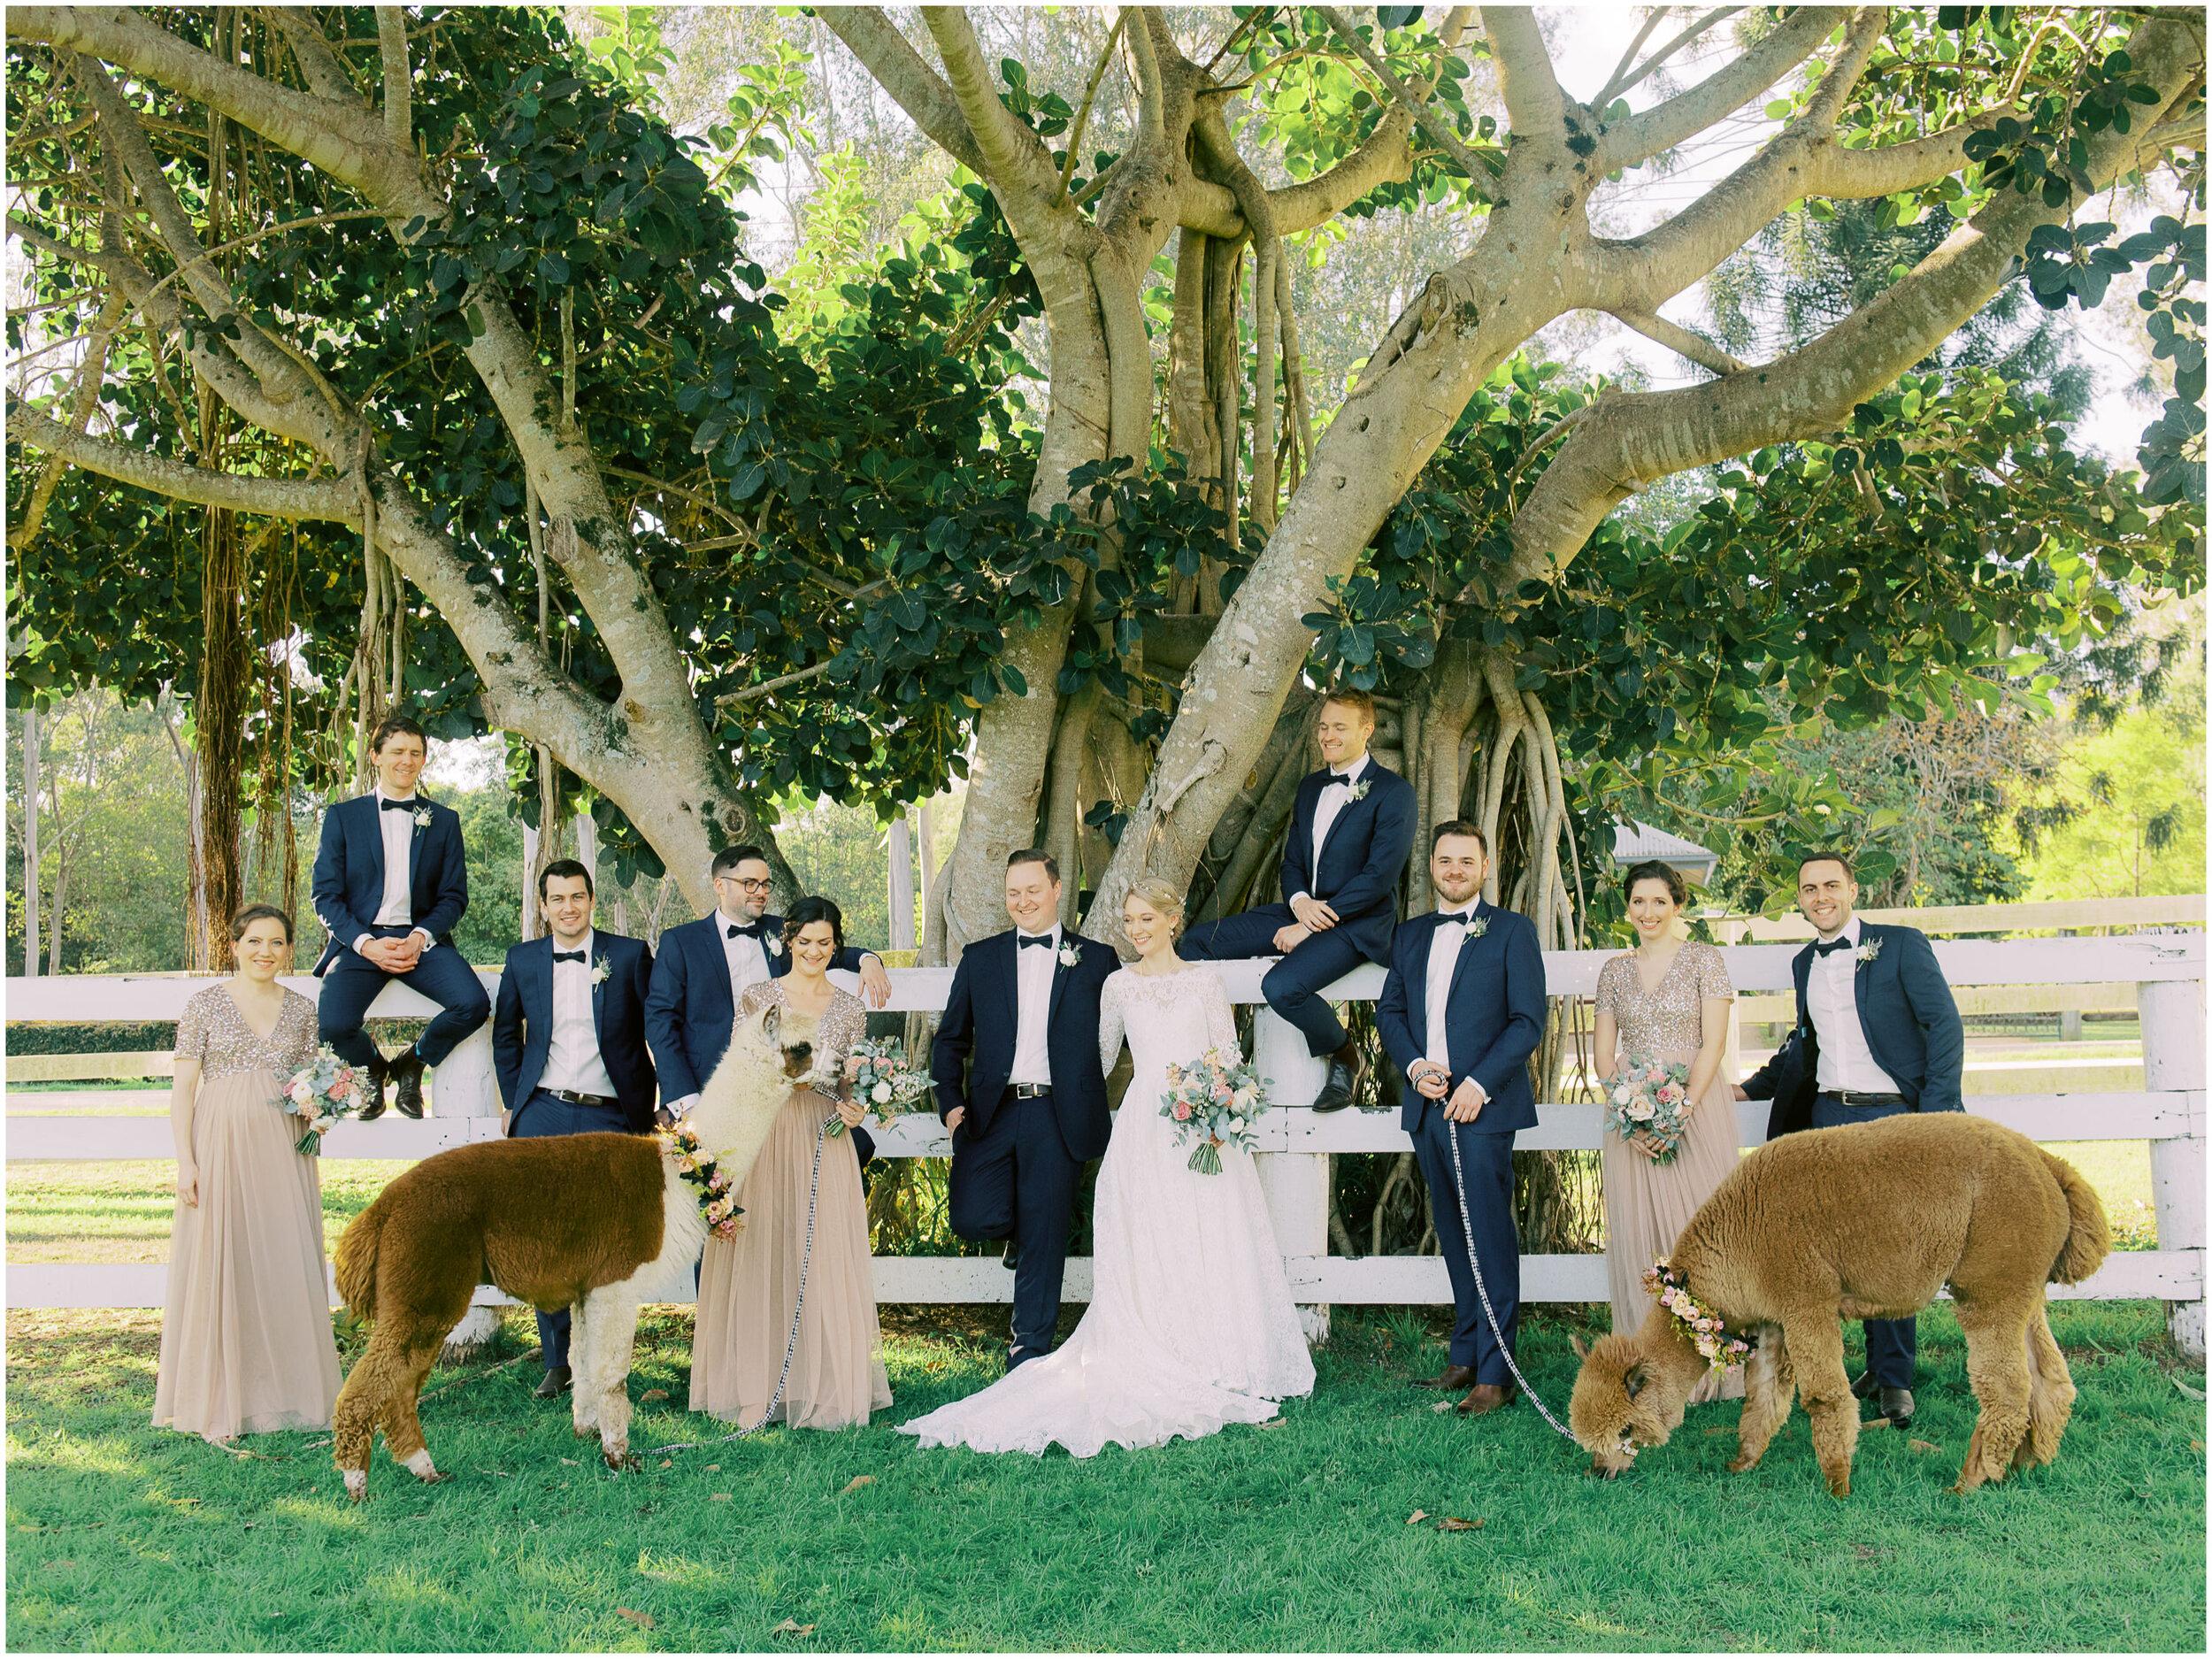 brisbane-film-wedding-photographer-lauren-olivia-luxury-wedding-australia-01-16.jpg